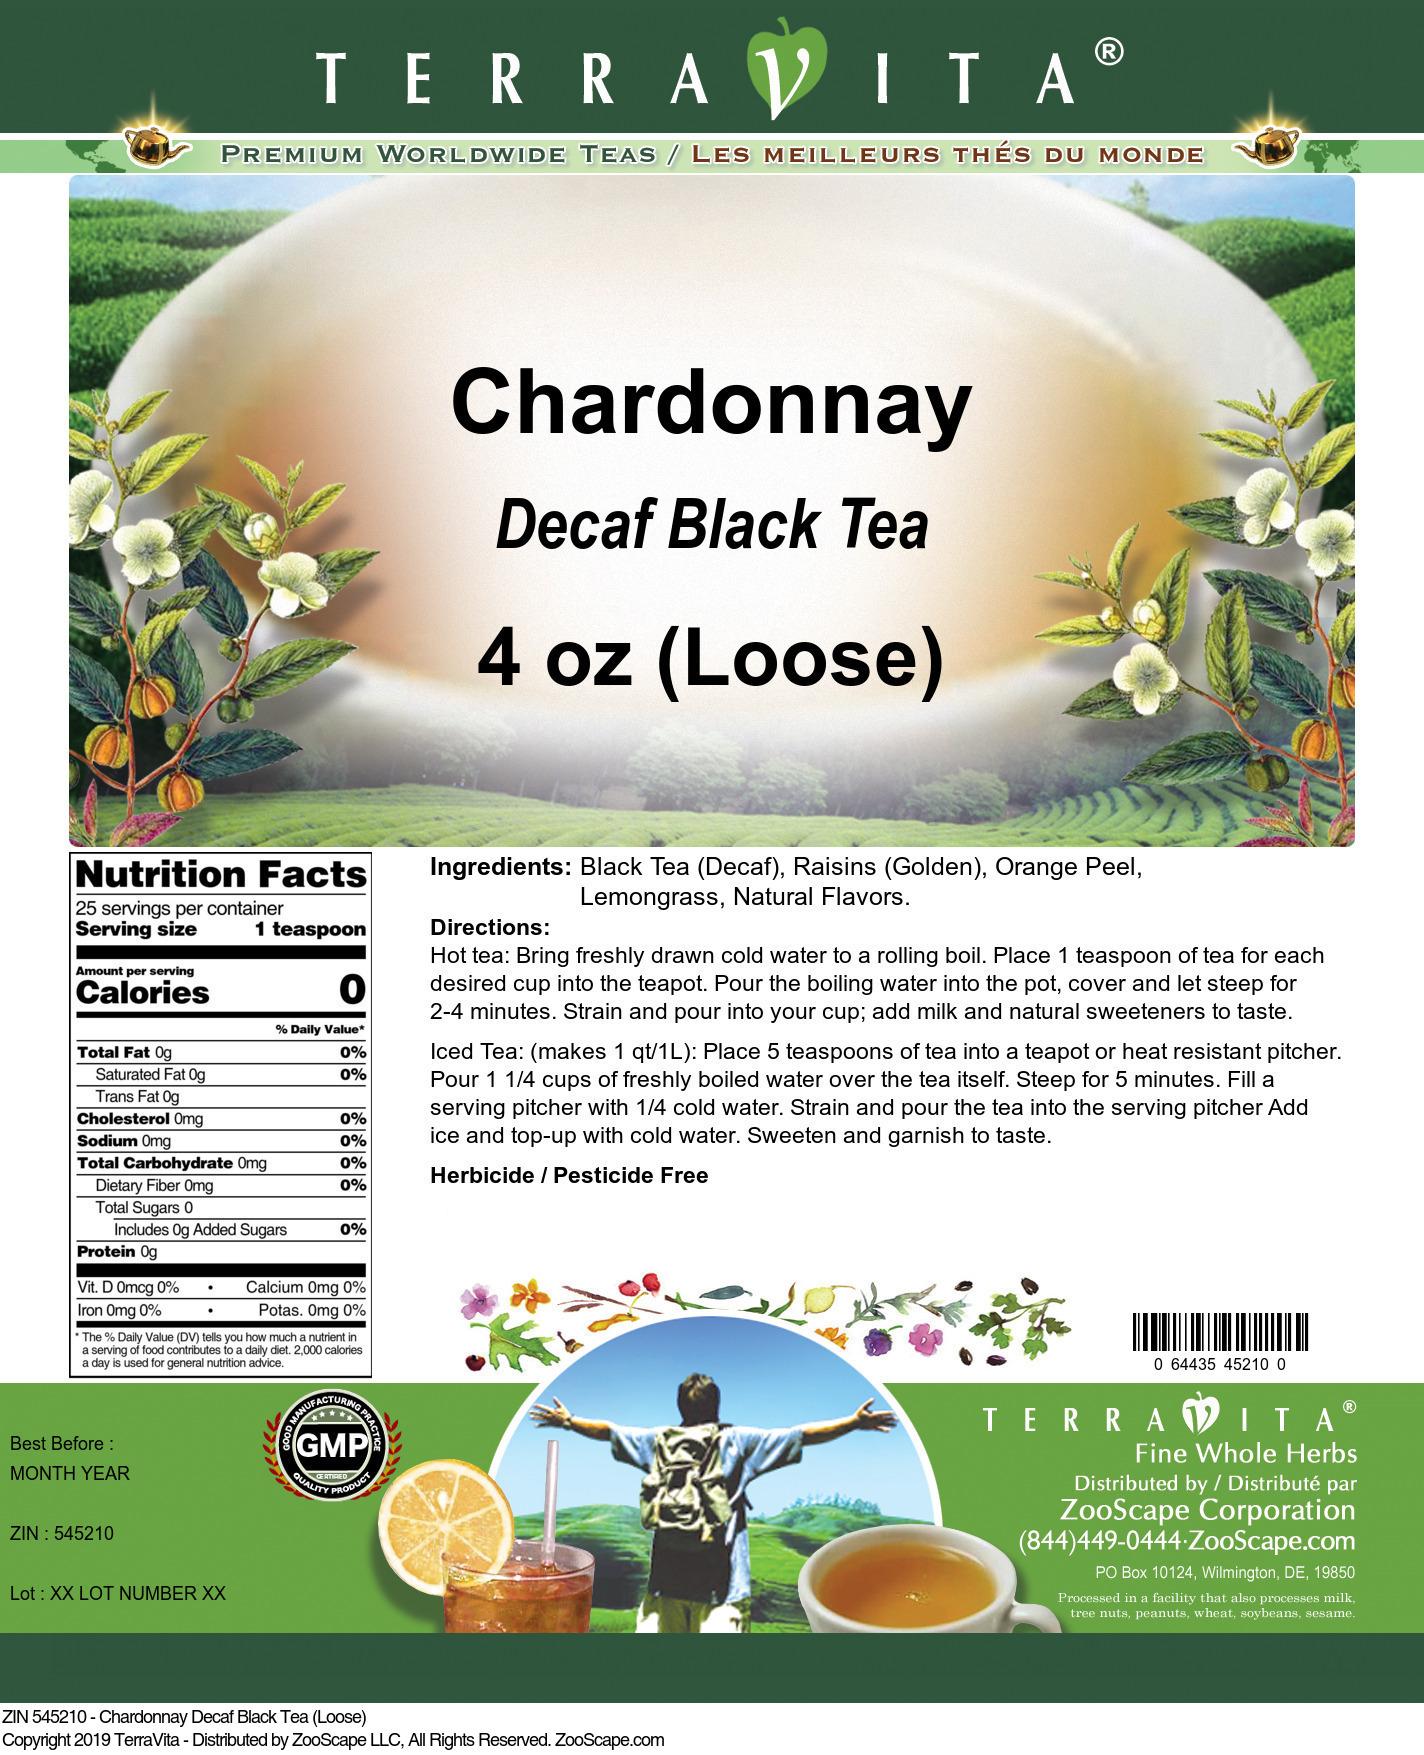 Chardonnay Decaf Black Tea